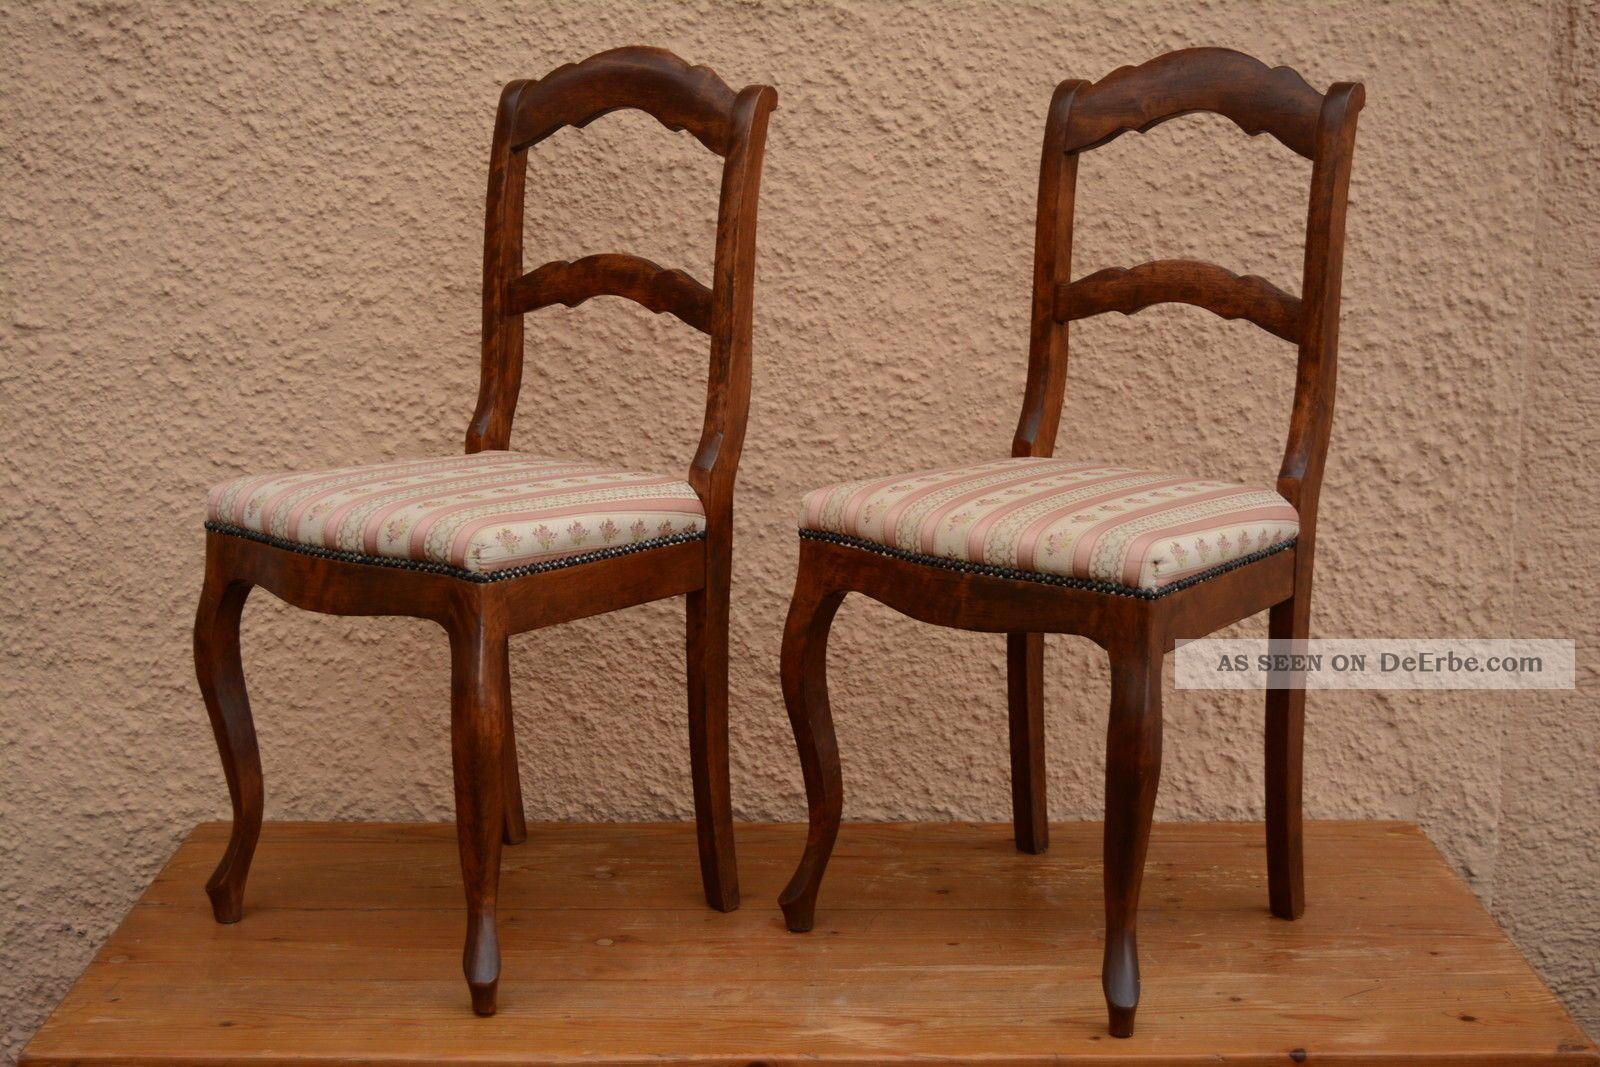 2 biedermeier nu baum st hle sch n gepolstert polster stuhl s ddeutsch vintage. Black Bedroom Furniture Sets. Home Design Ideas